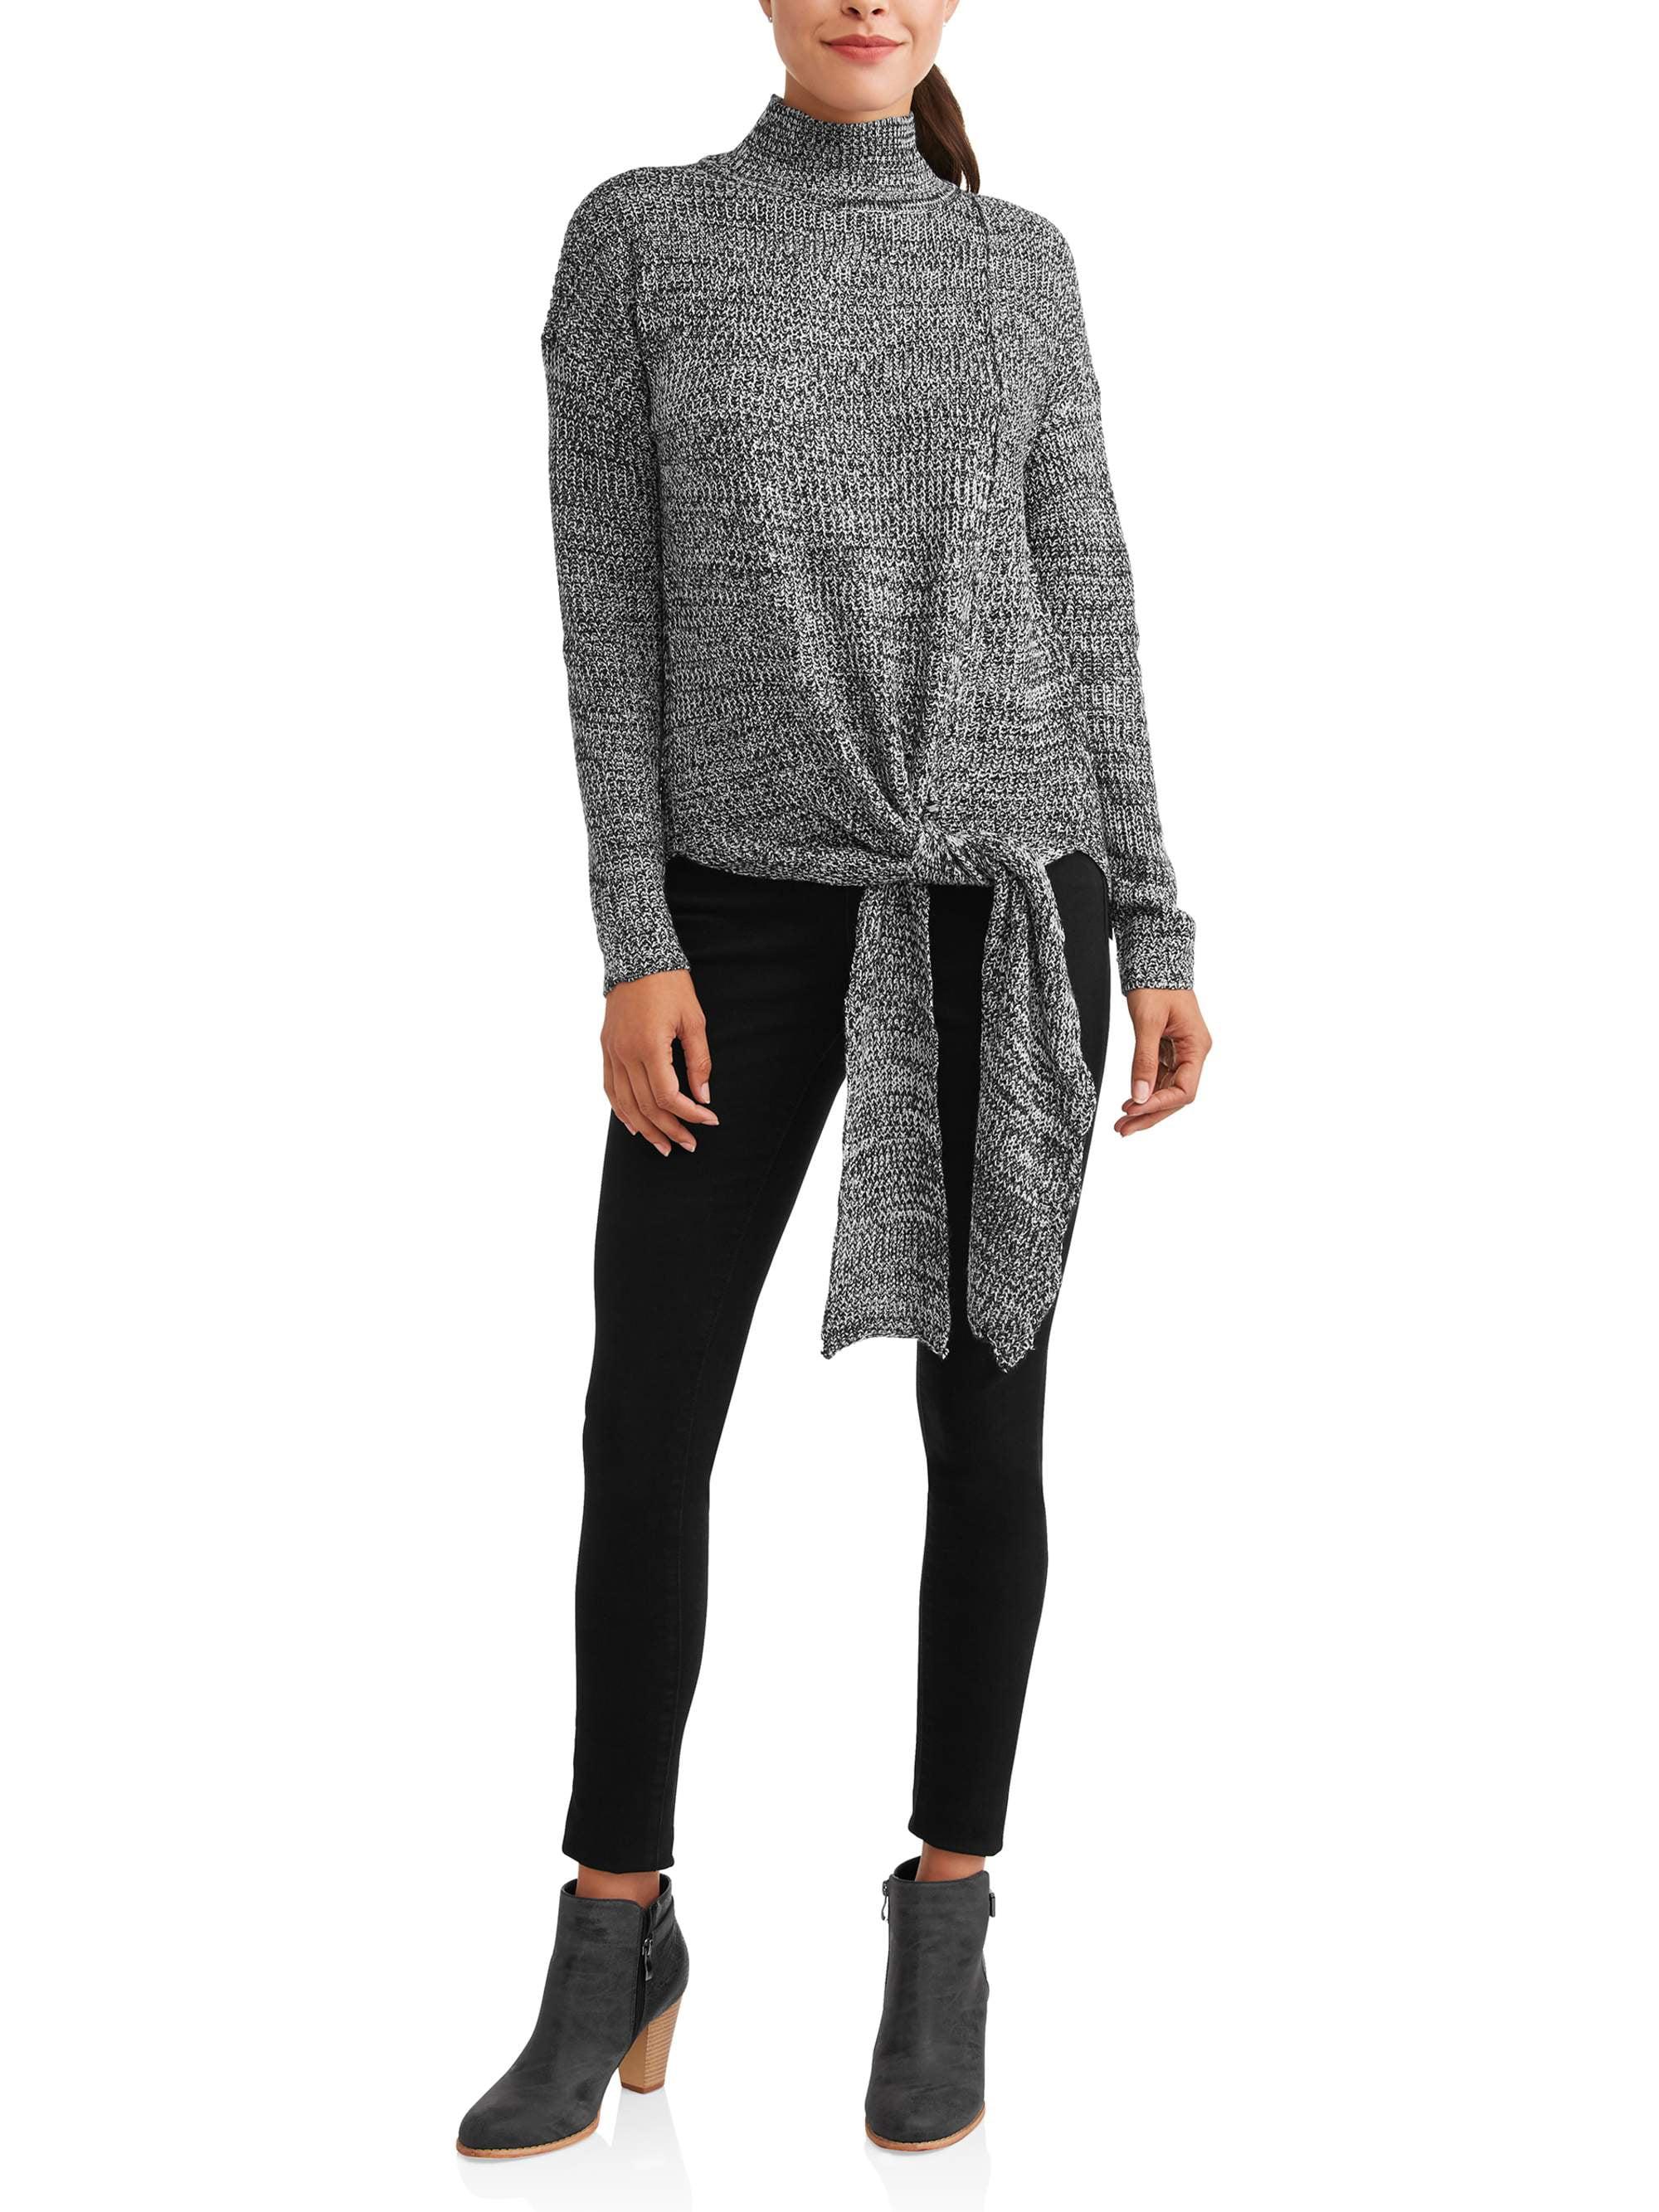 Women's Side Tie Sweater by CUDLIE- 12.28